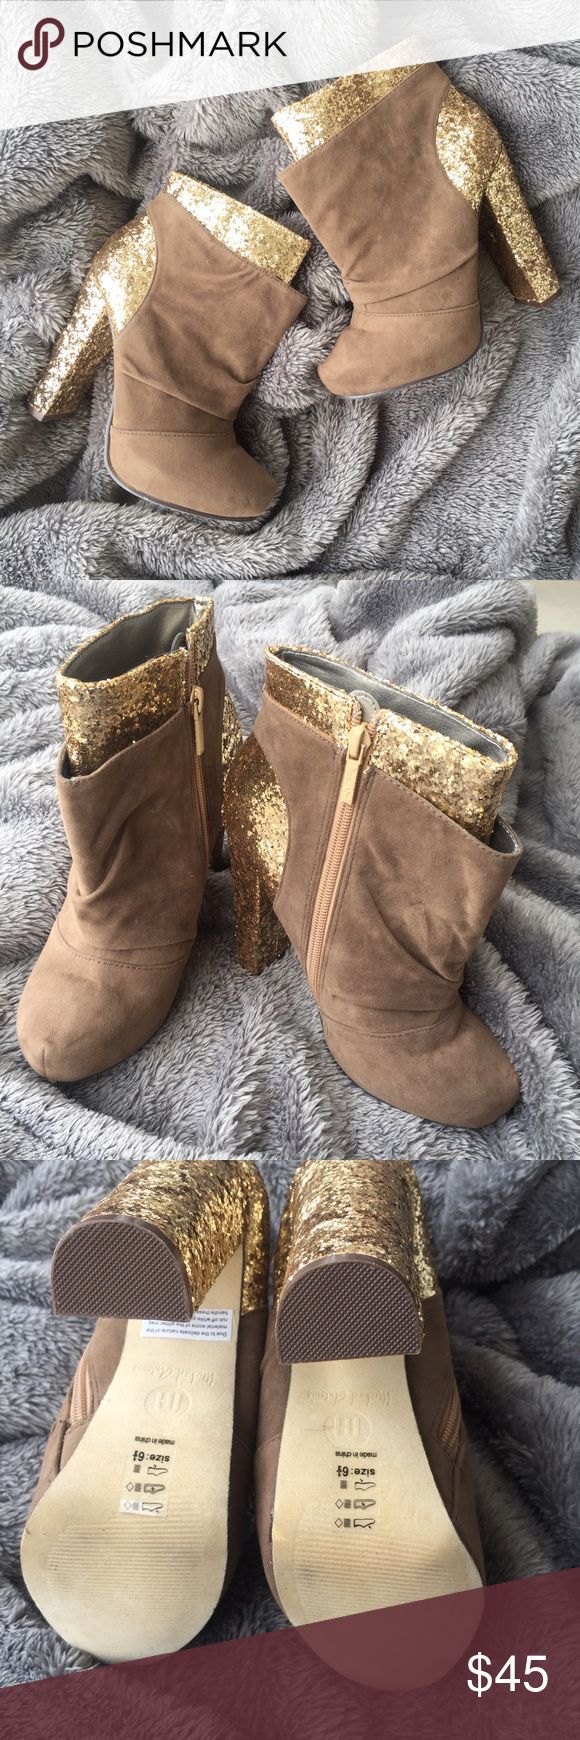 "Michael Antonio Taupe Velvet Glitter High Boot 6.5 New without box Michael Antonio Taupe Velvet Glitter High Heel Platform Mills Boots Size 6.5 Heel is 5"". Michael Antonio Shoes Heeled Boots"